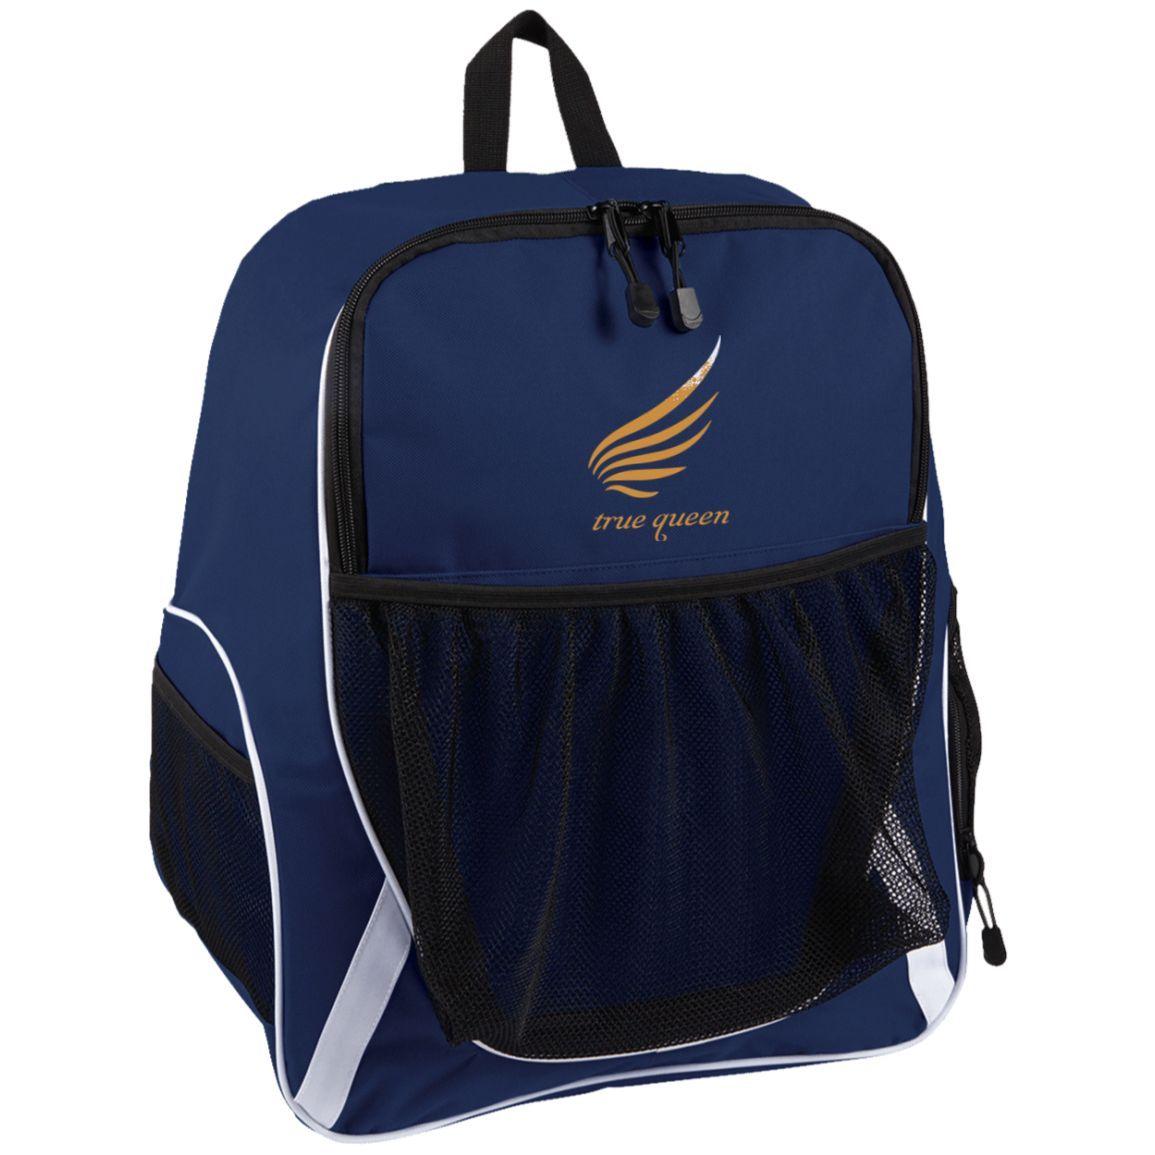 Team 365 Equipment Bag